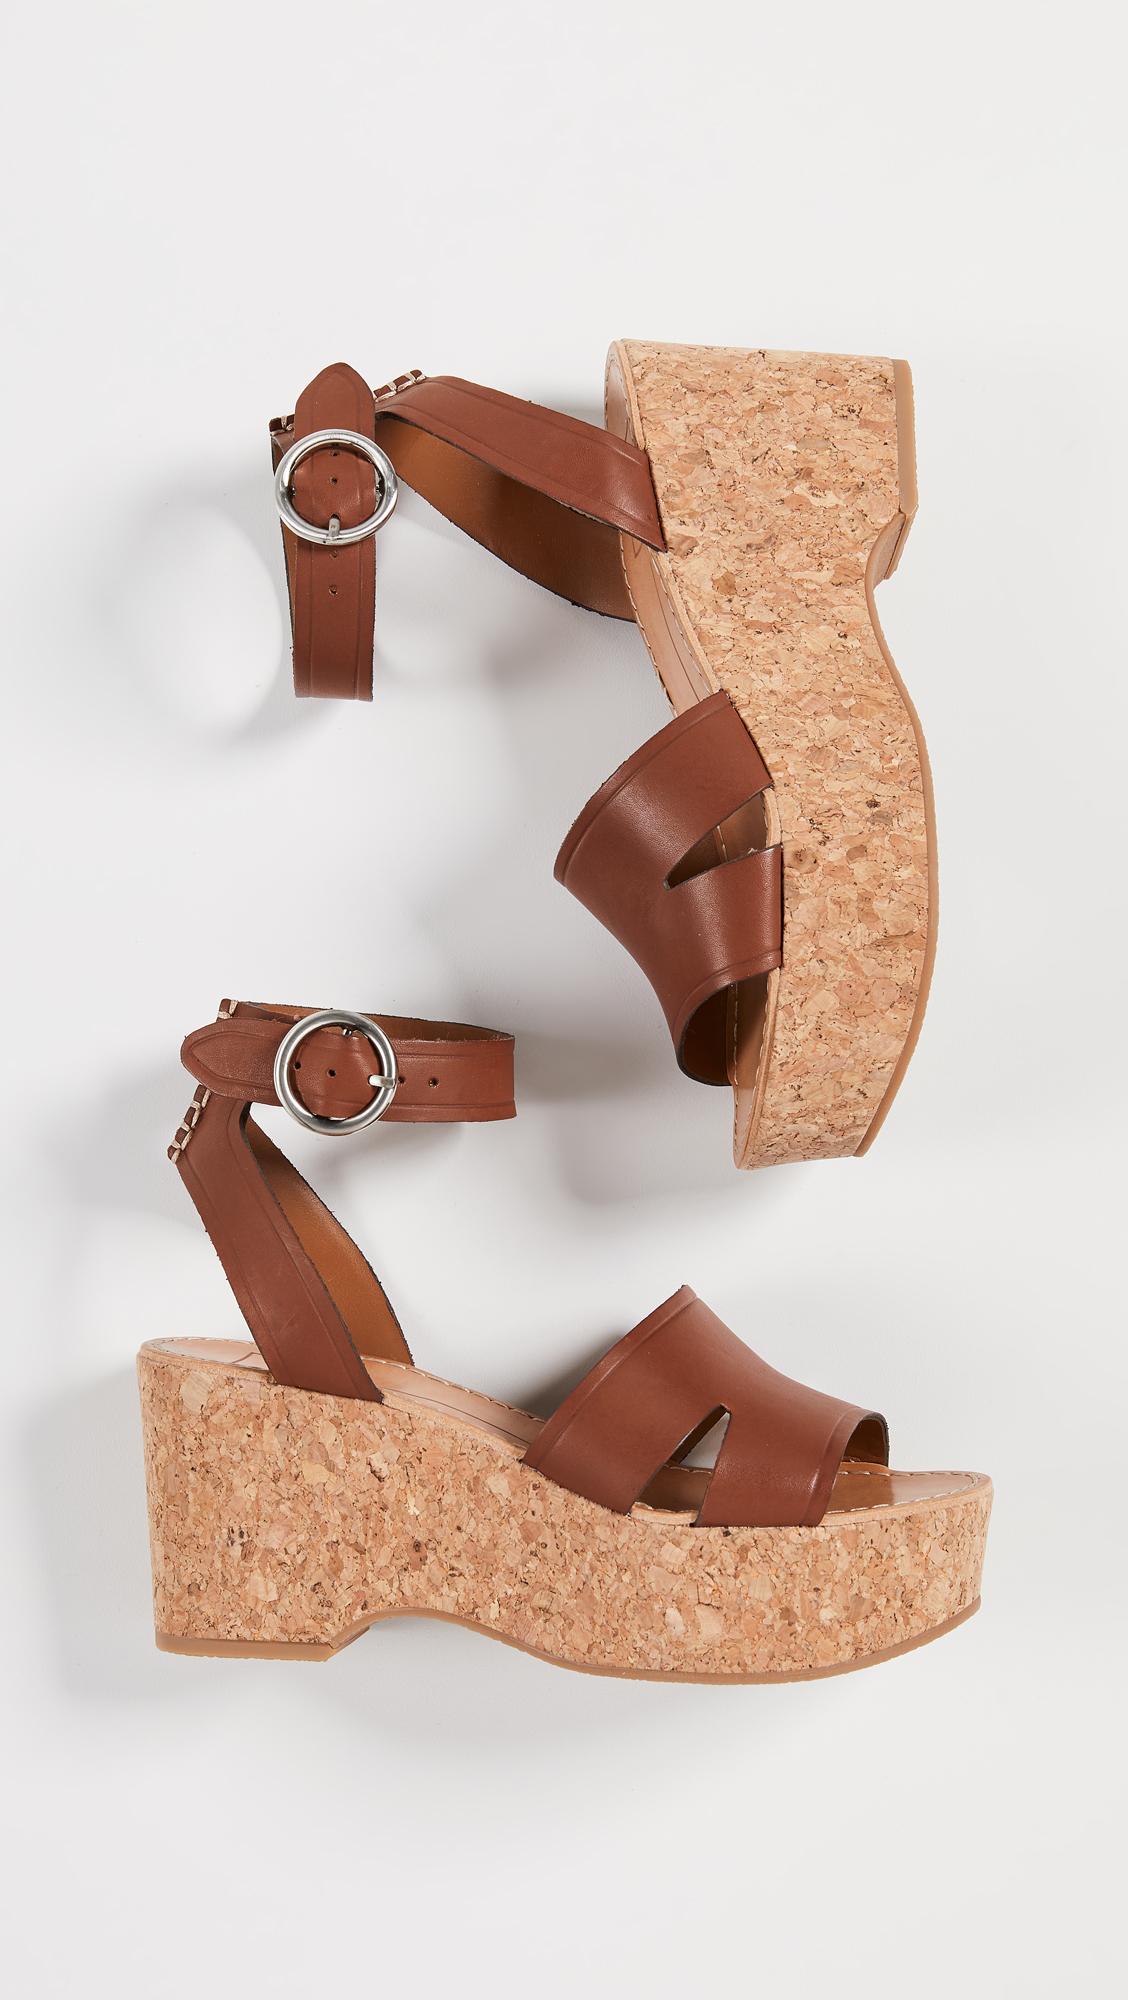 942e84f19d4c Dolce Vita Linda Ankle Strap Sandals